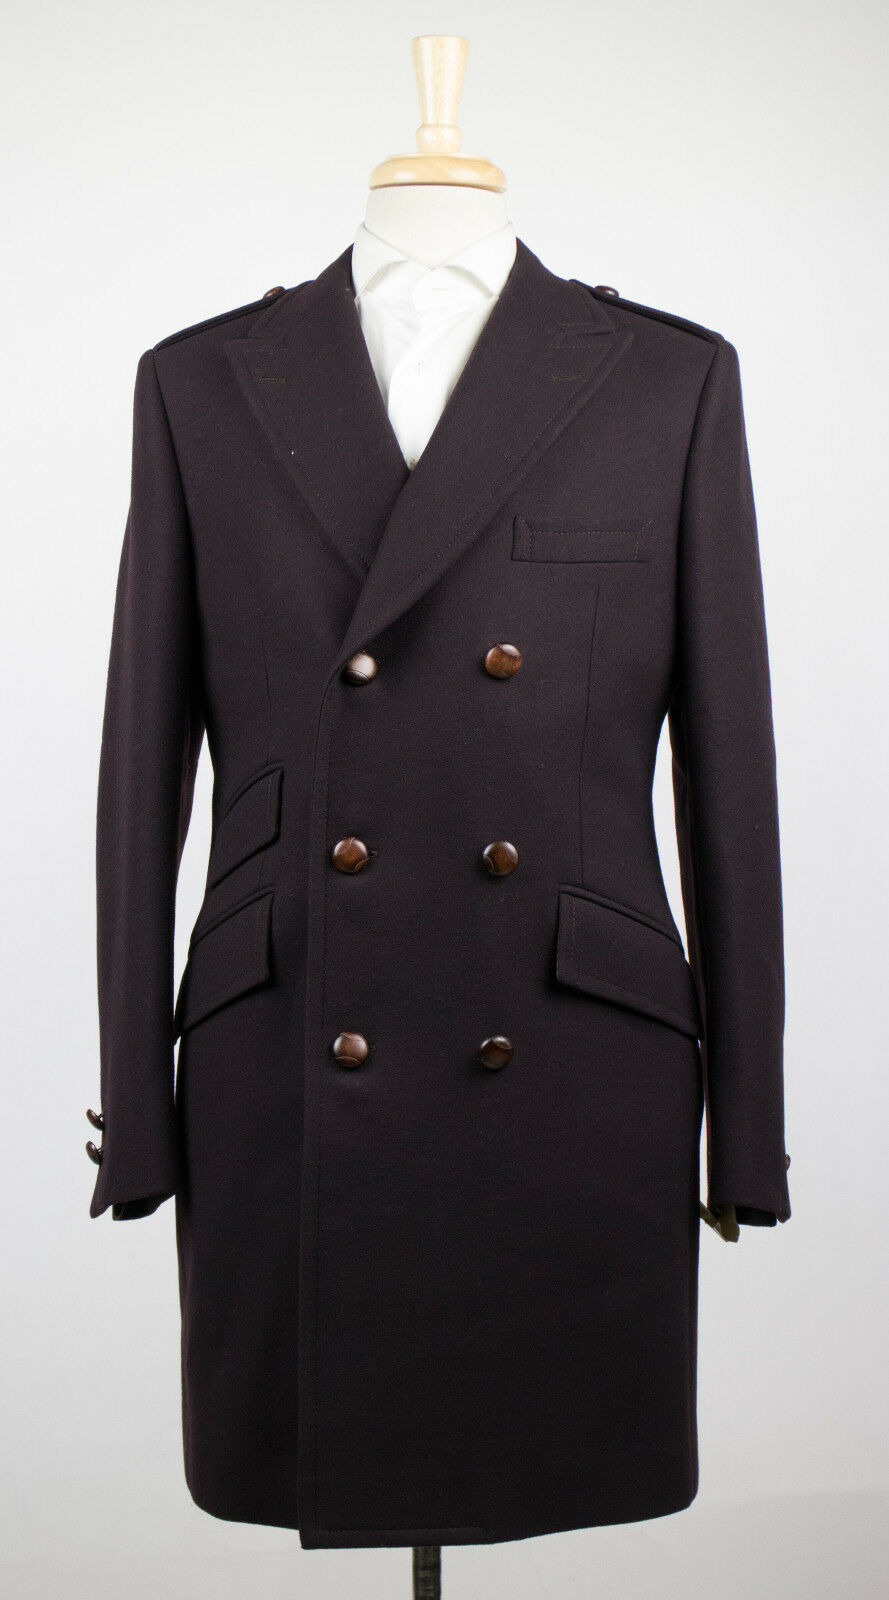 New D'AVENZA Dark Braun Wool 3/4 Length Pea Coat Größe 53/43 R 3795